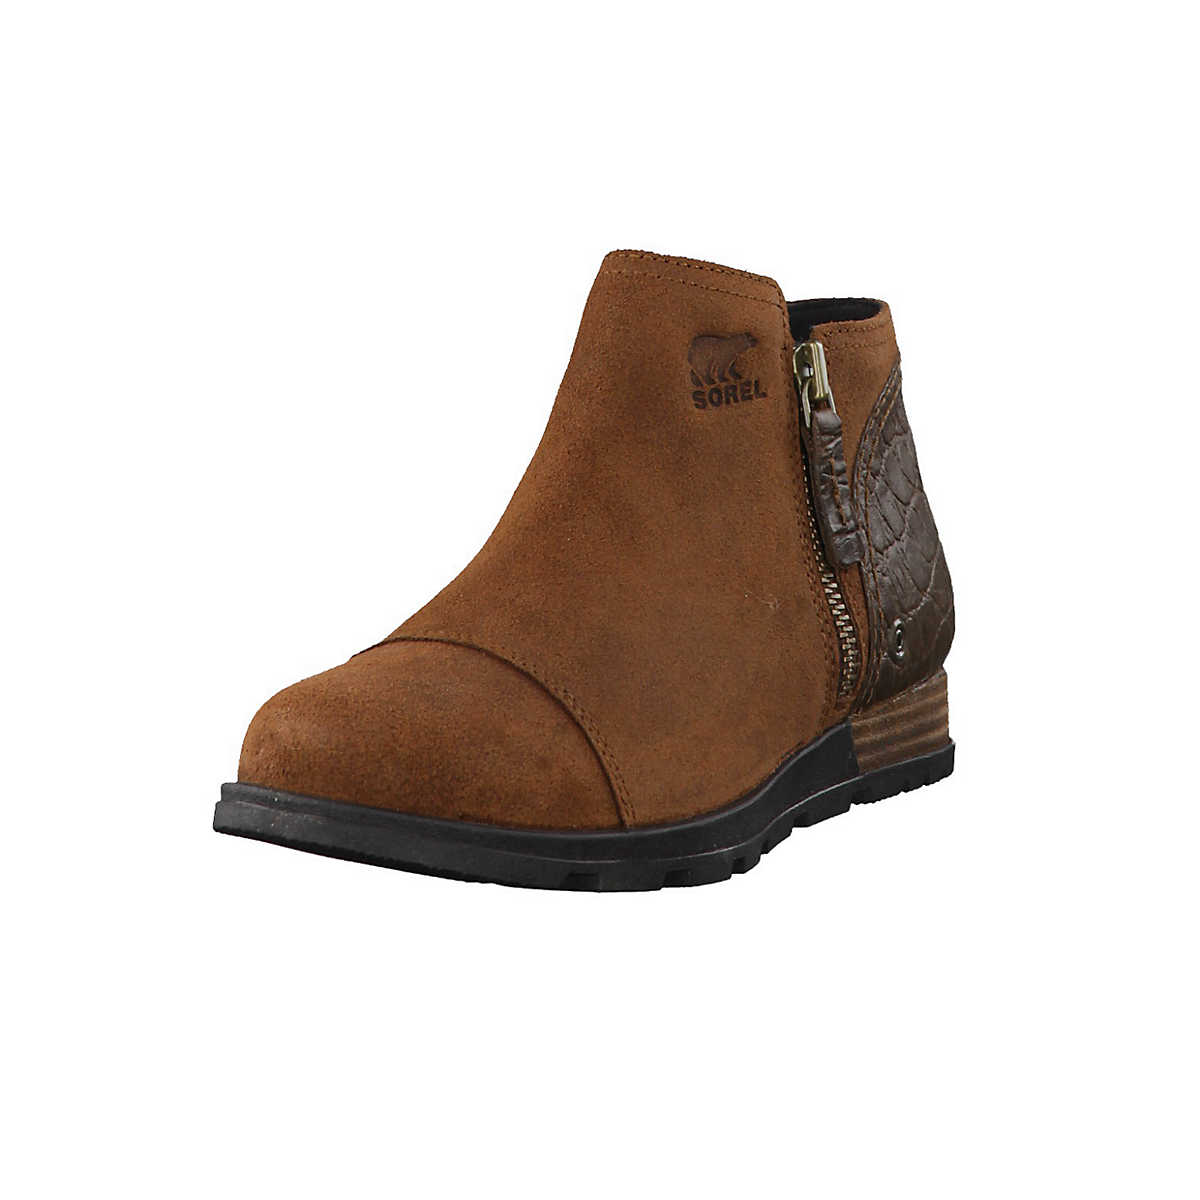 SOREL Stiefel braun - SOREL - Stiefeletten - Schuhe - mirapodo.de